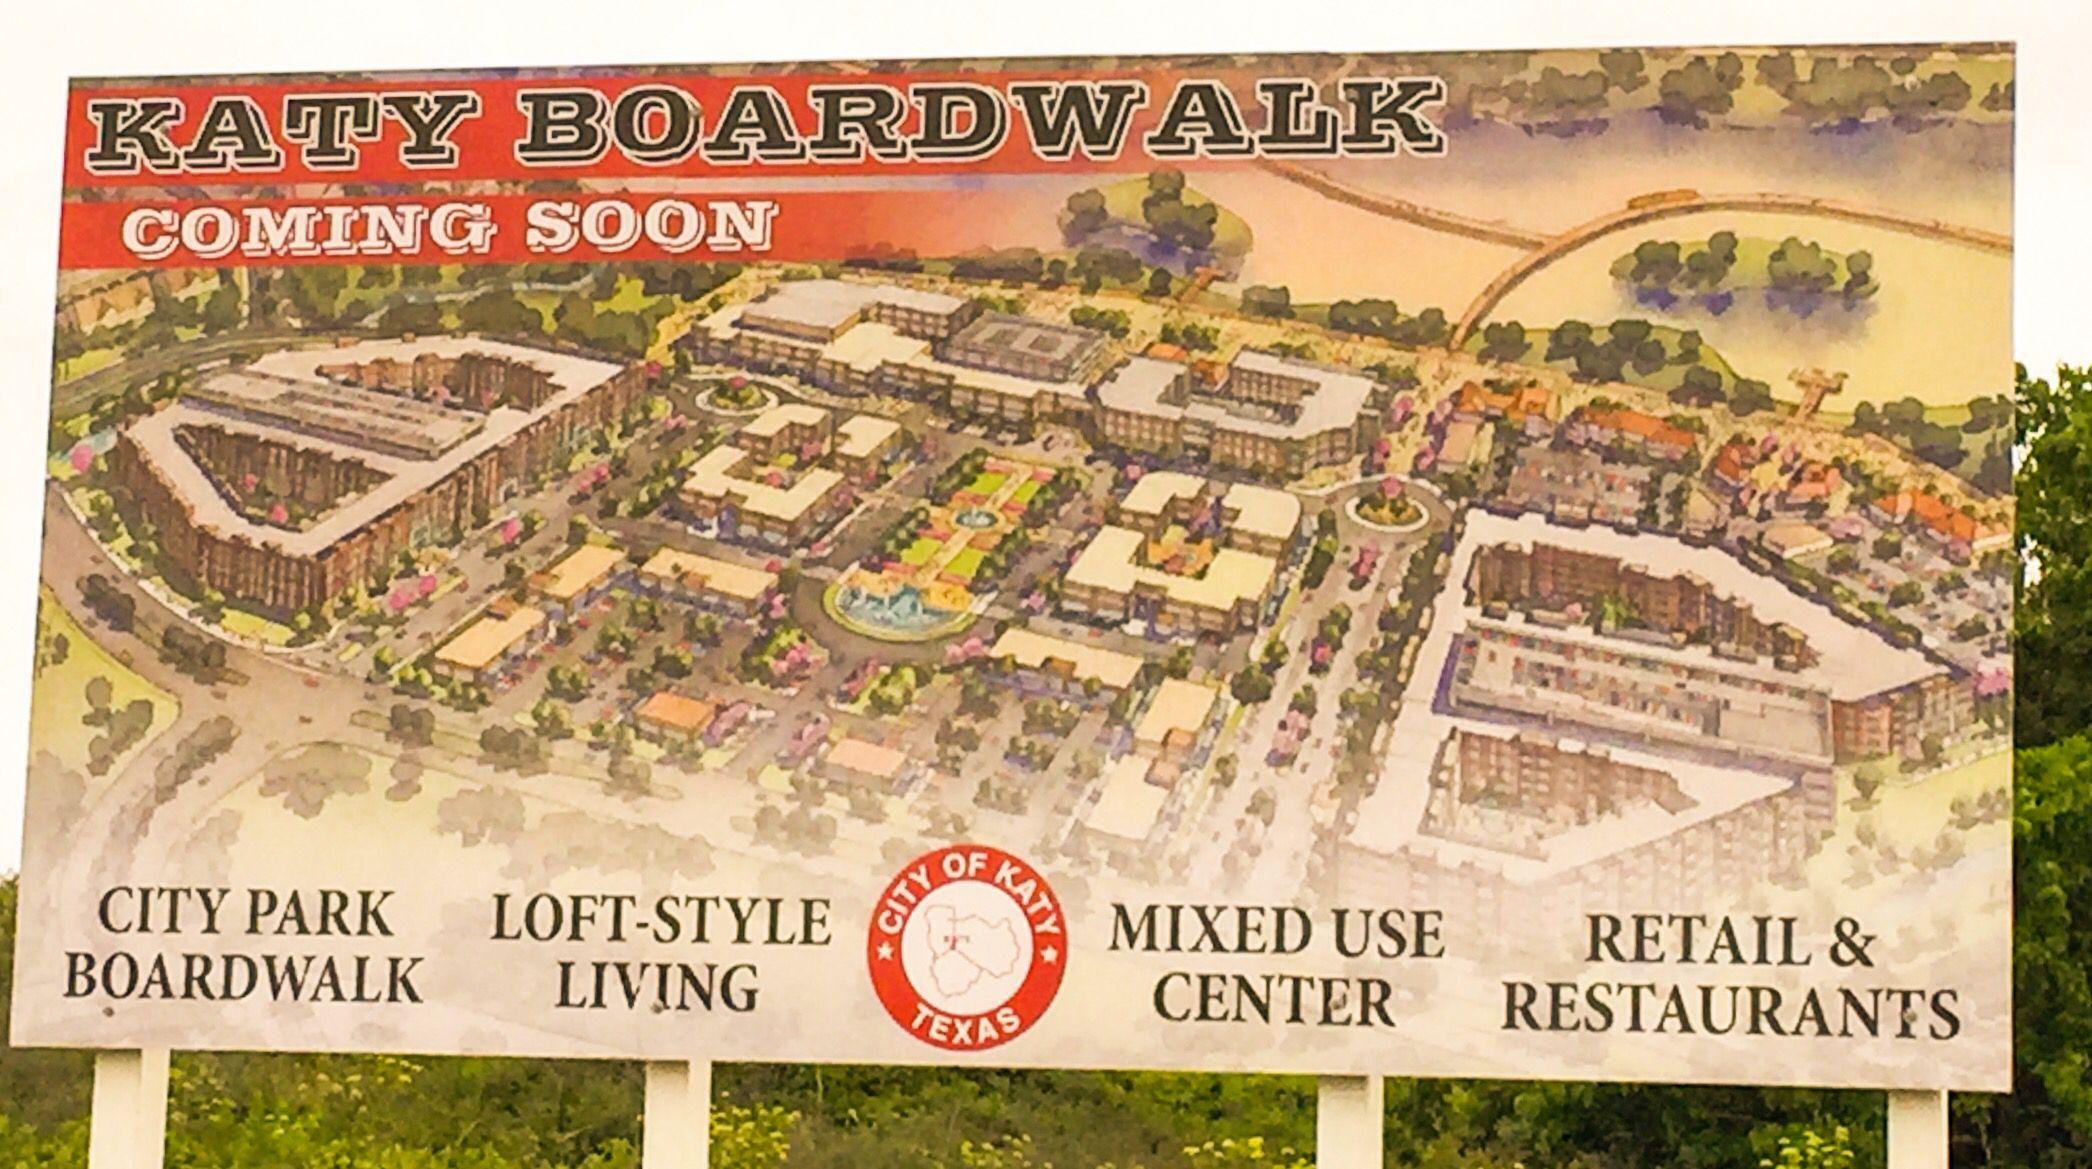 Houston tx KatyTx boardwalk coming